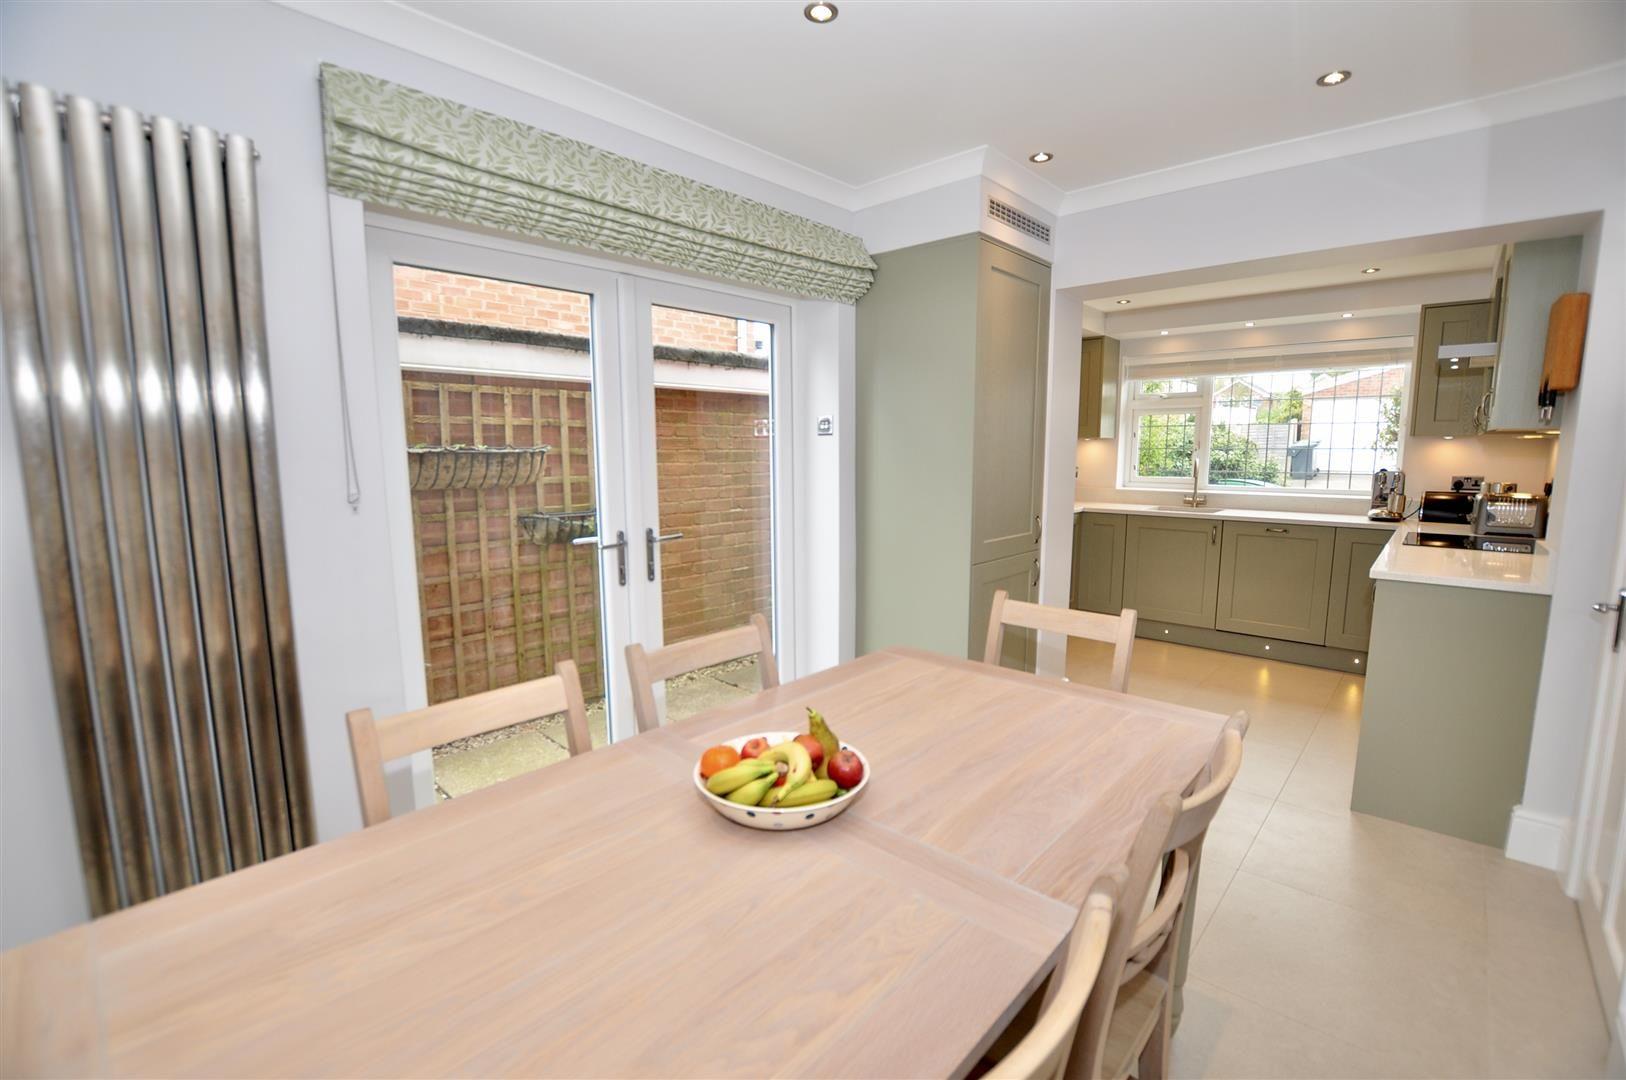 4 bed link-detached-house for sale in Hagley  - Property Image 4